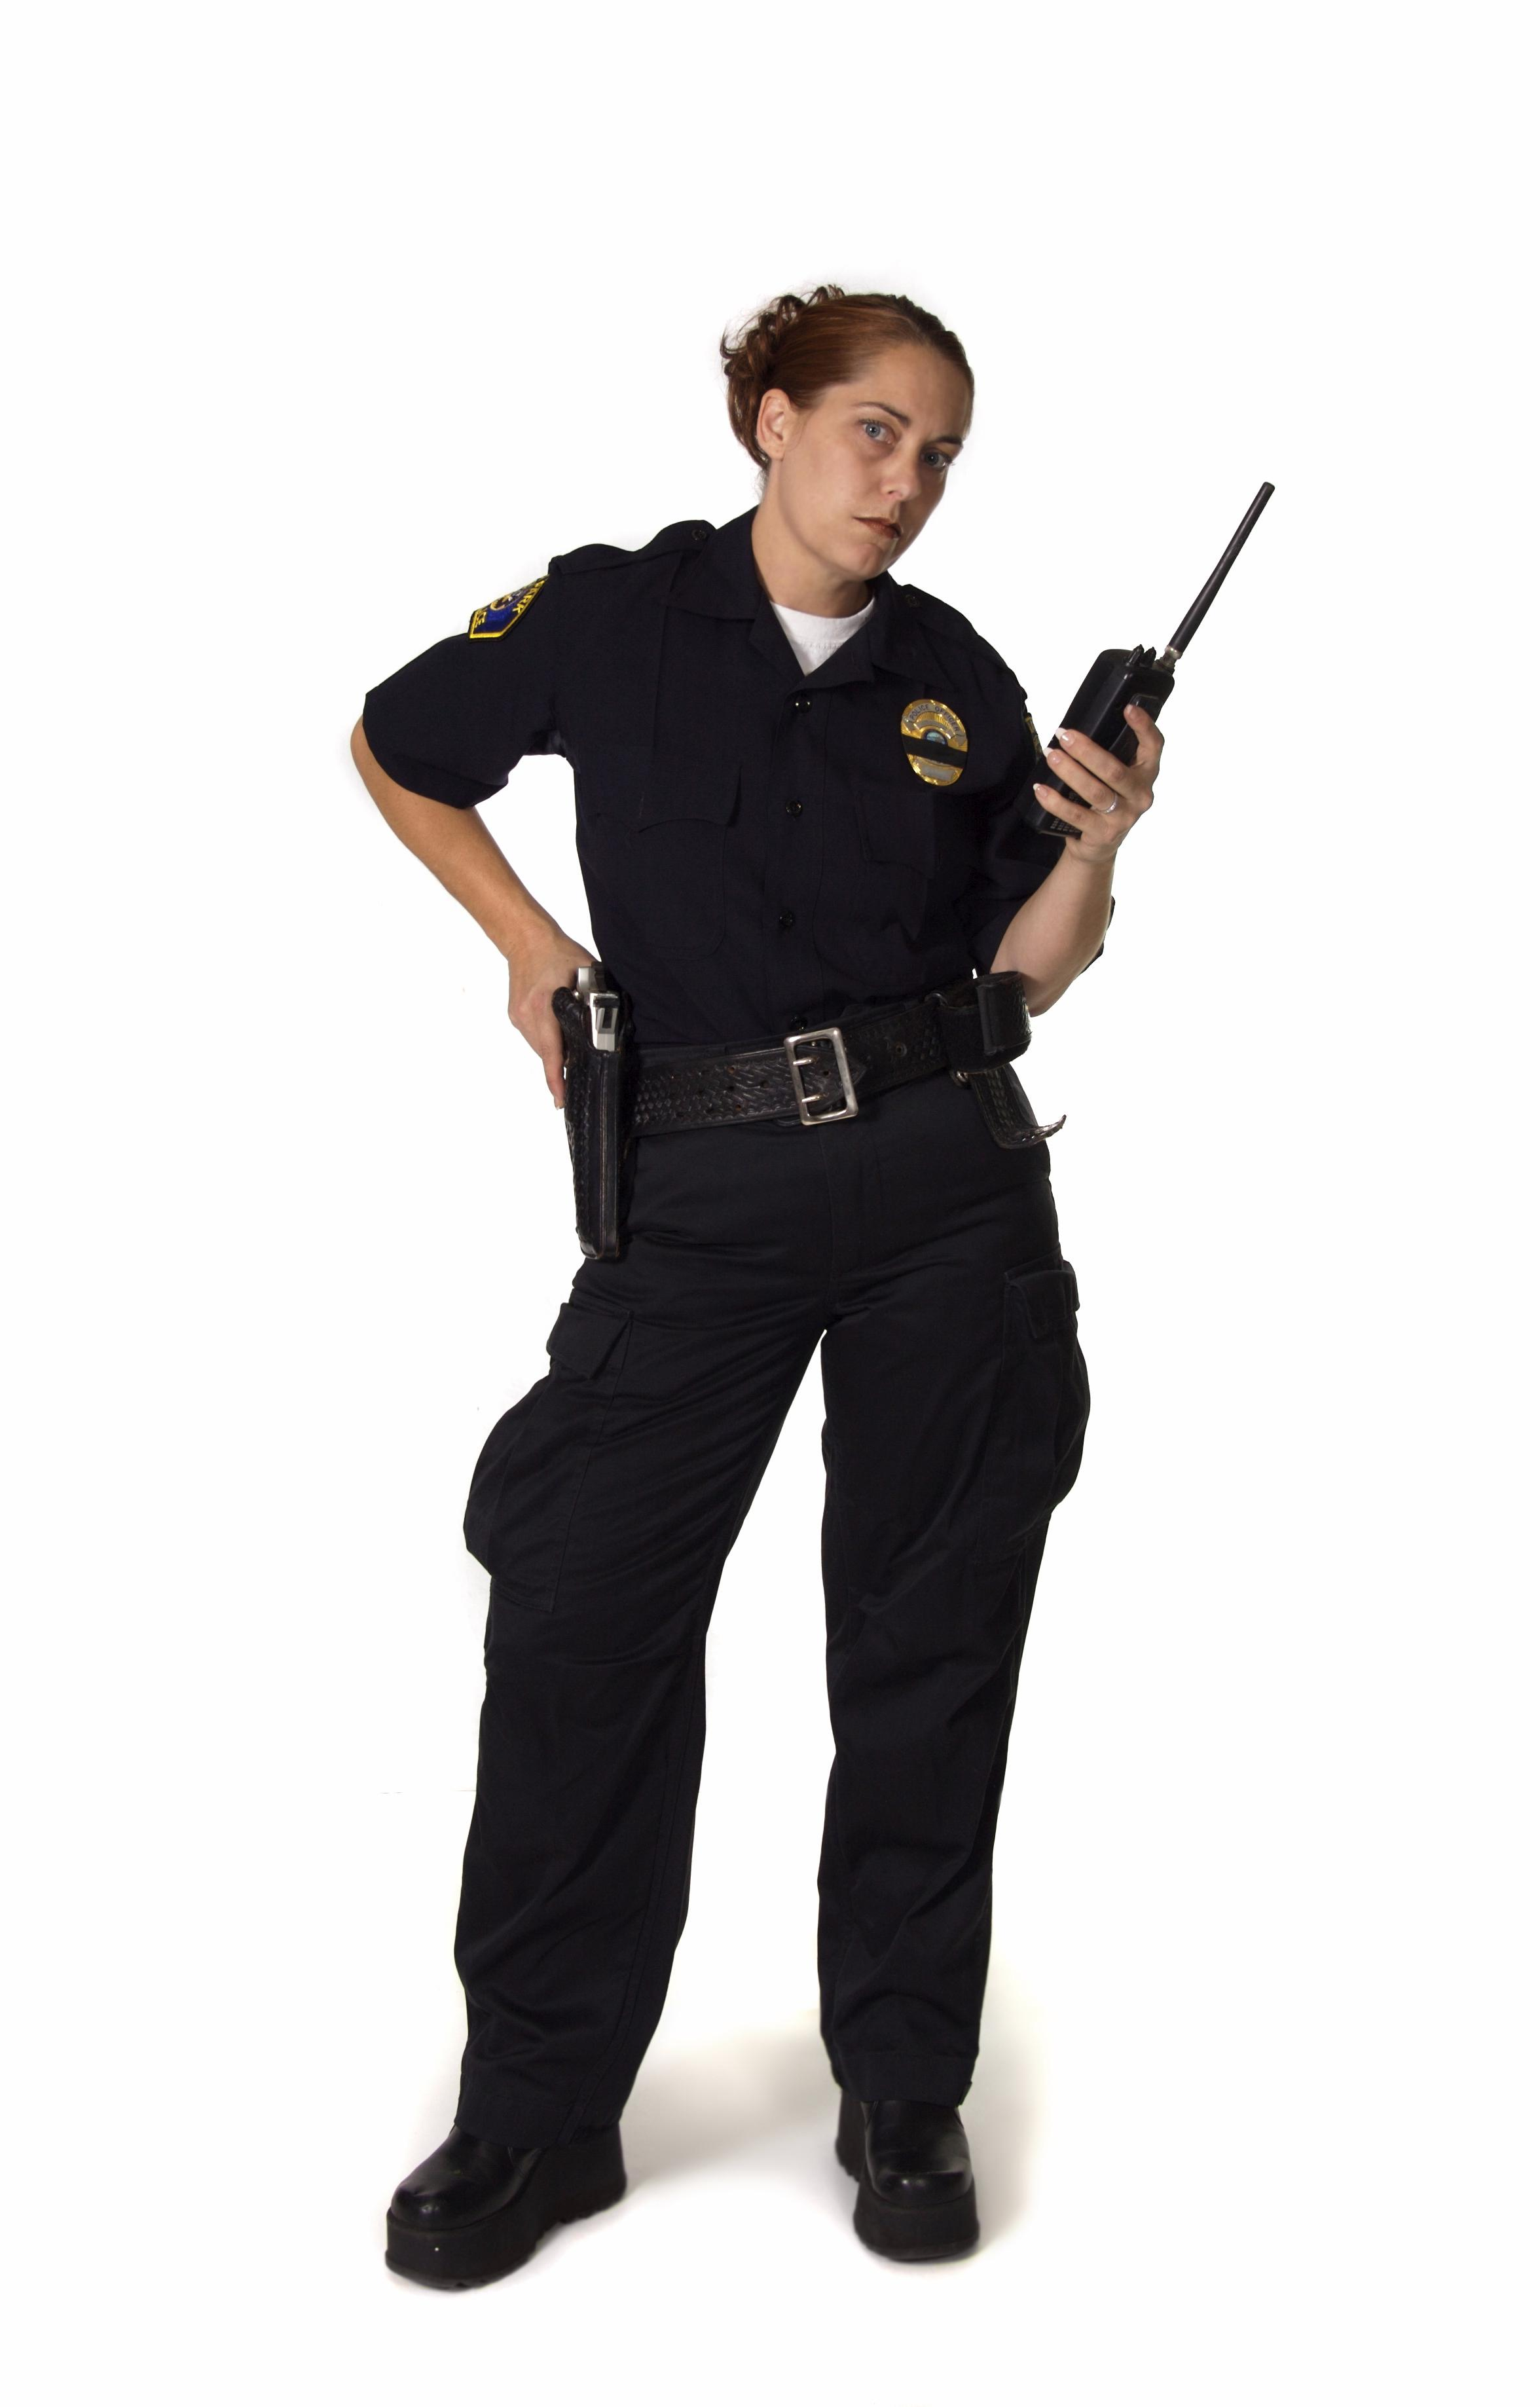 Female Officer Holding Radio With Hard on Gun